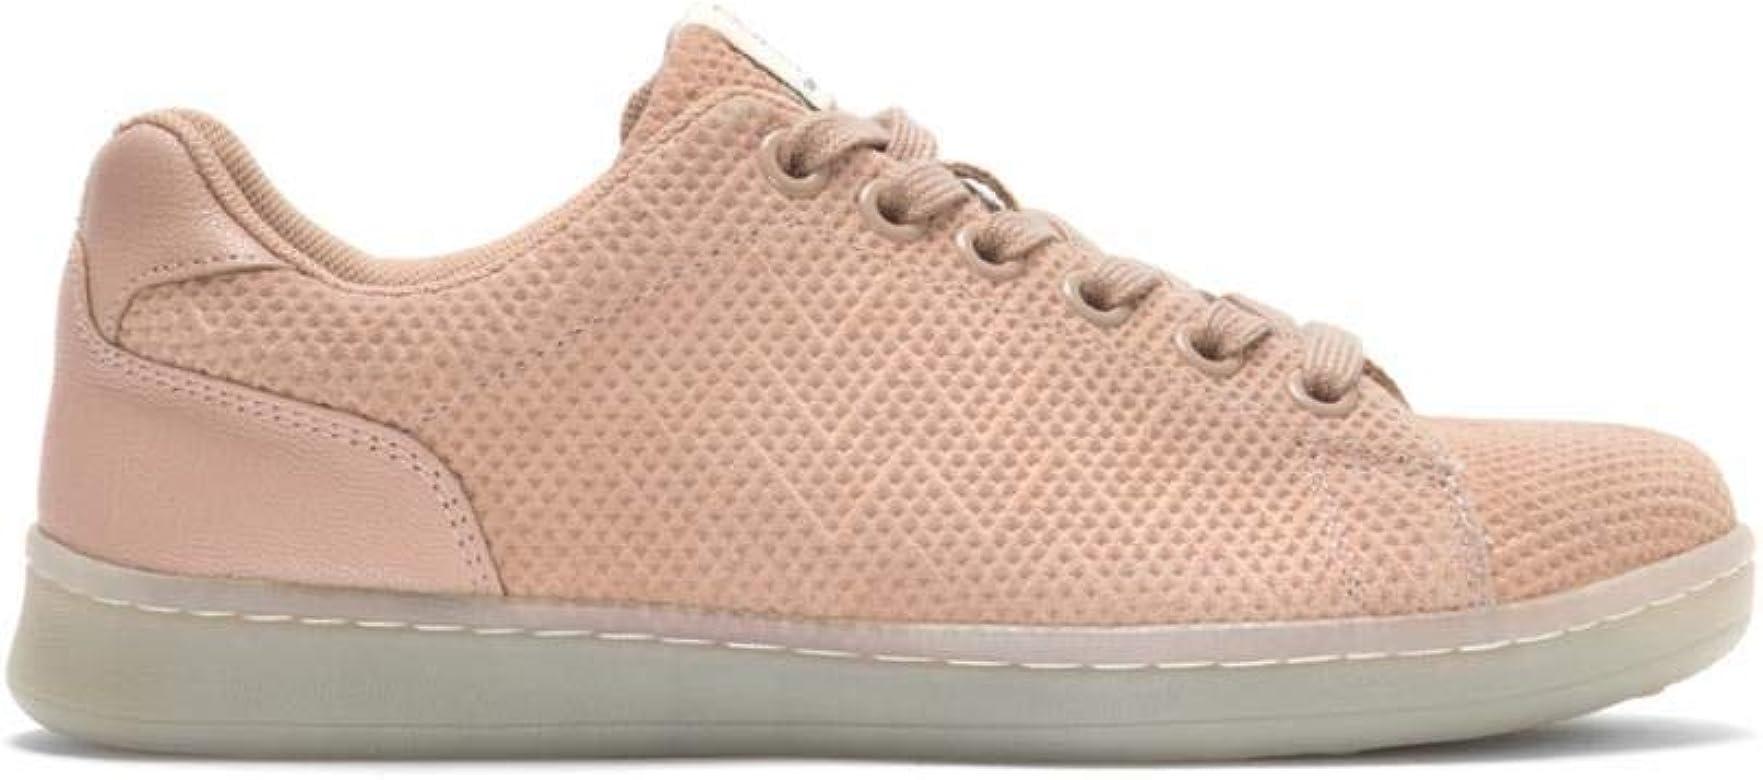 Womens Top Fashion Low Chapala Sneakers Fabric Up Lace WDIH9E2